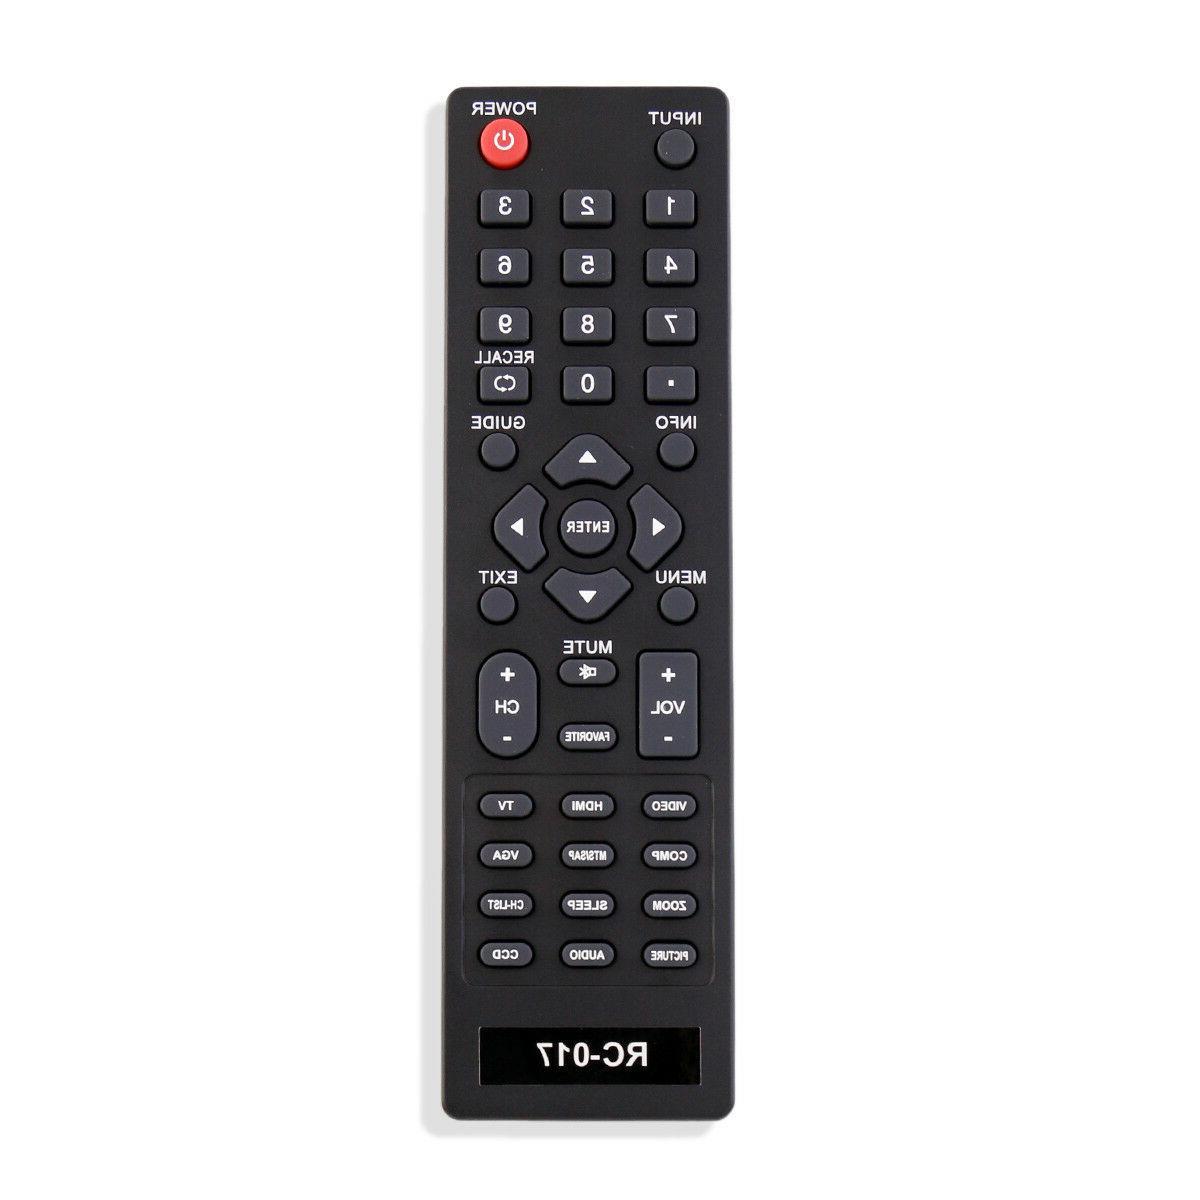 New Remote Dynex DX-32L100A13 DX-55L150A1Z DX-46L262A12